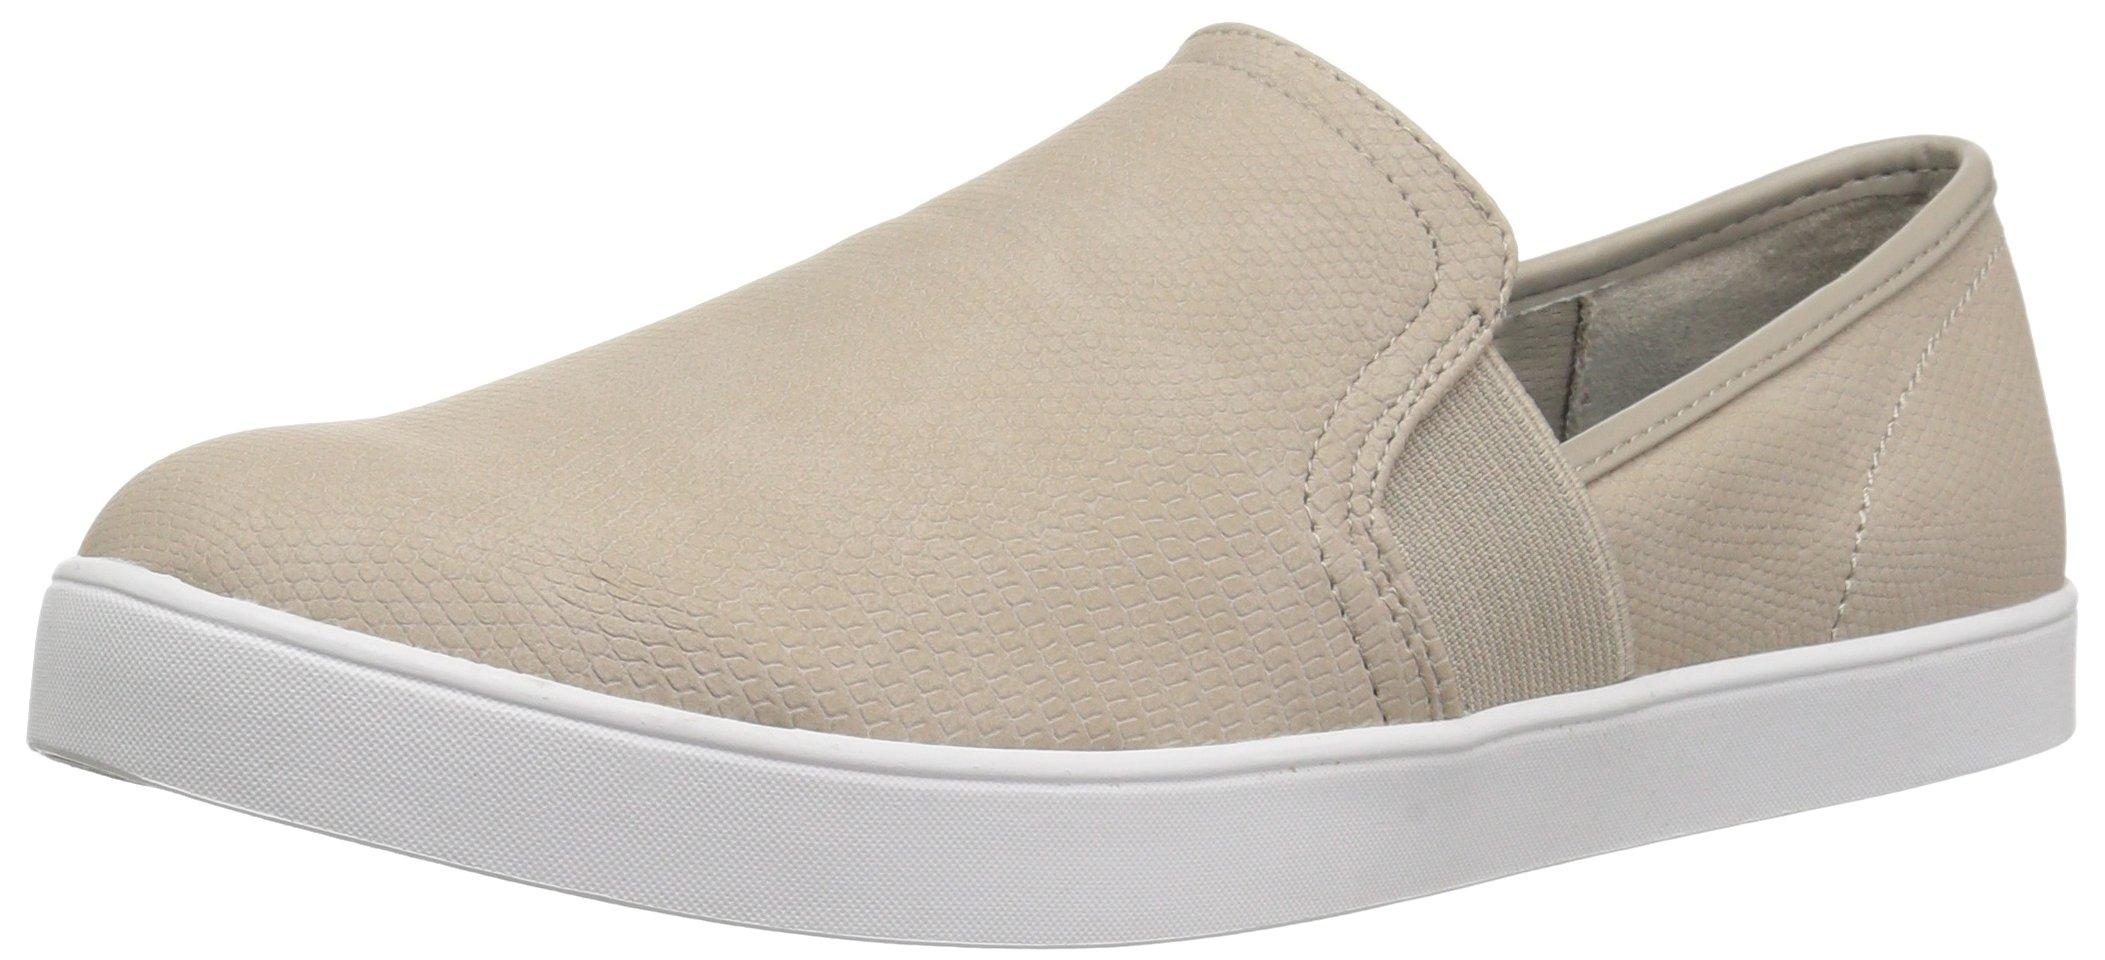 Dr Scholls Shoes Womens Sneaker